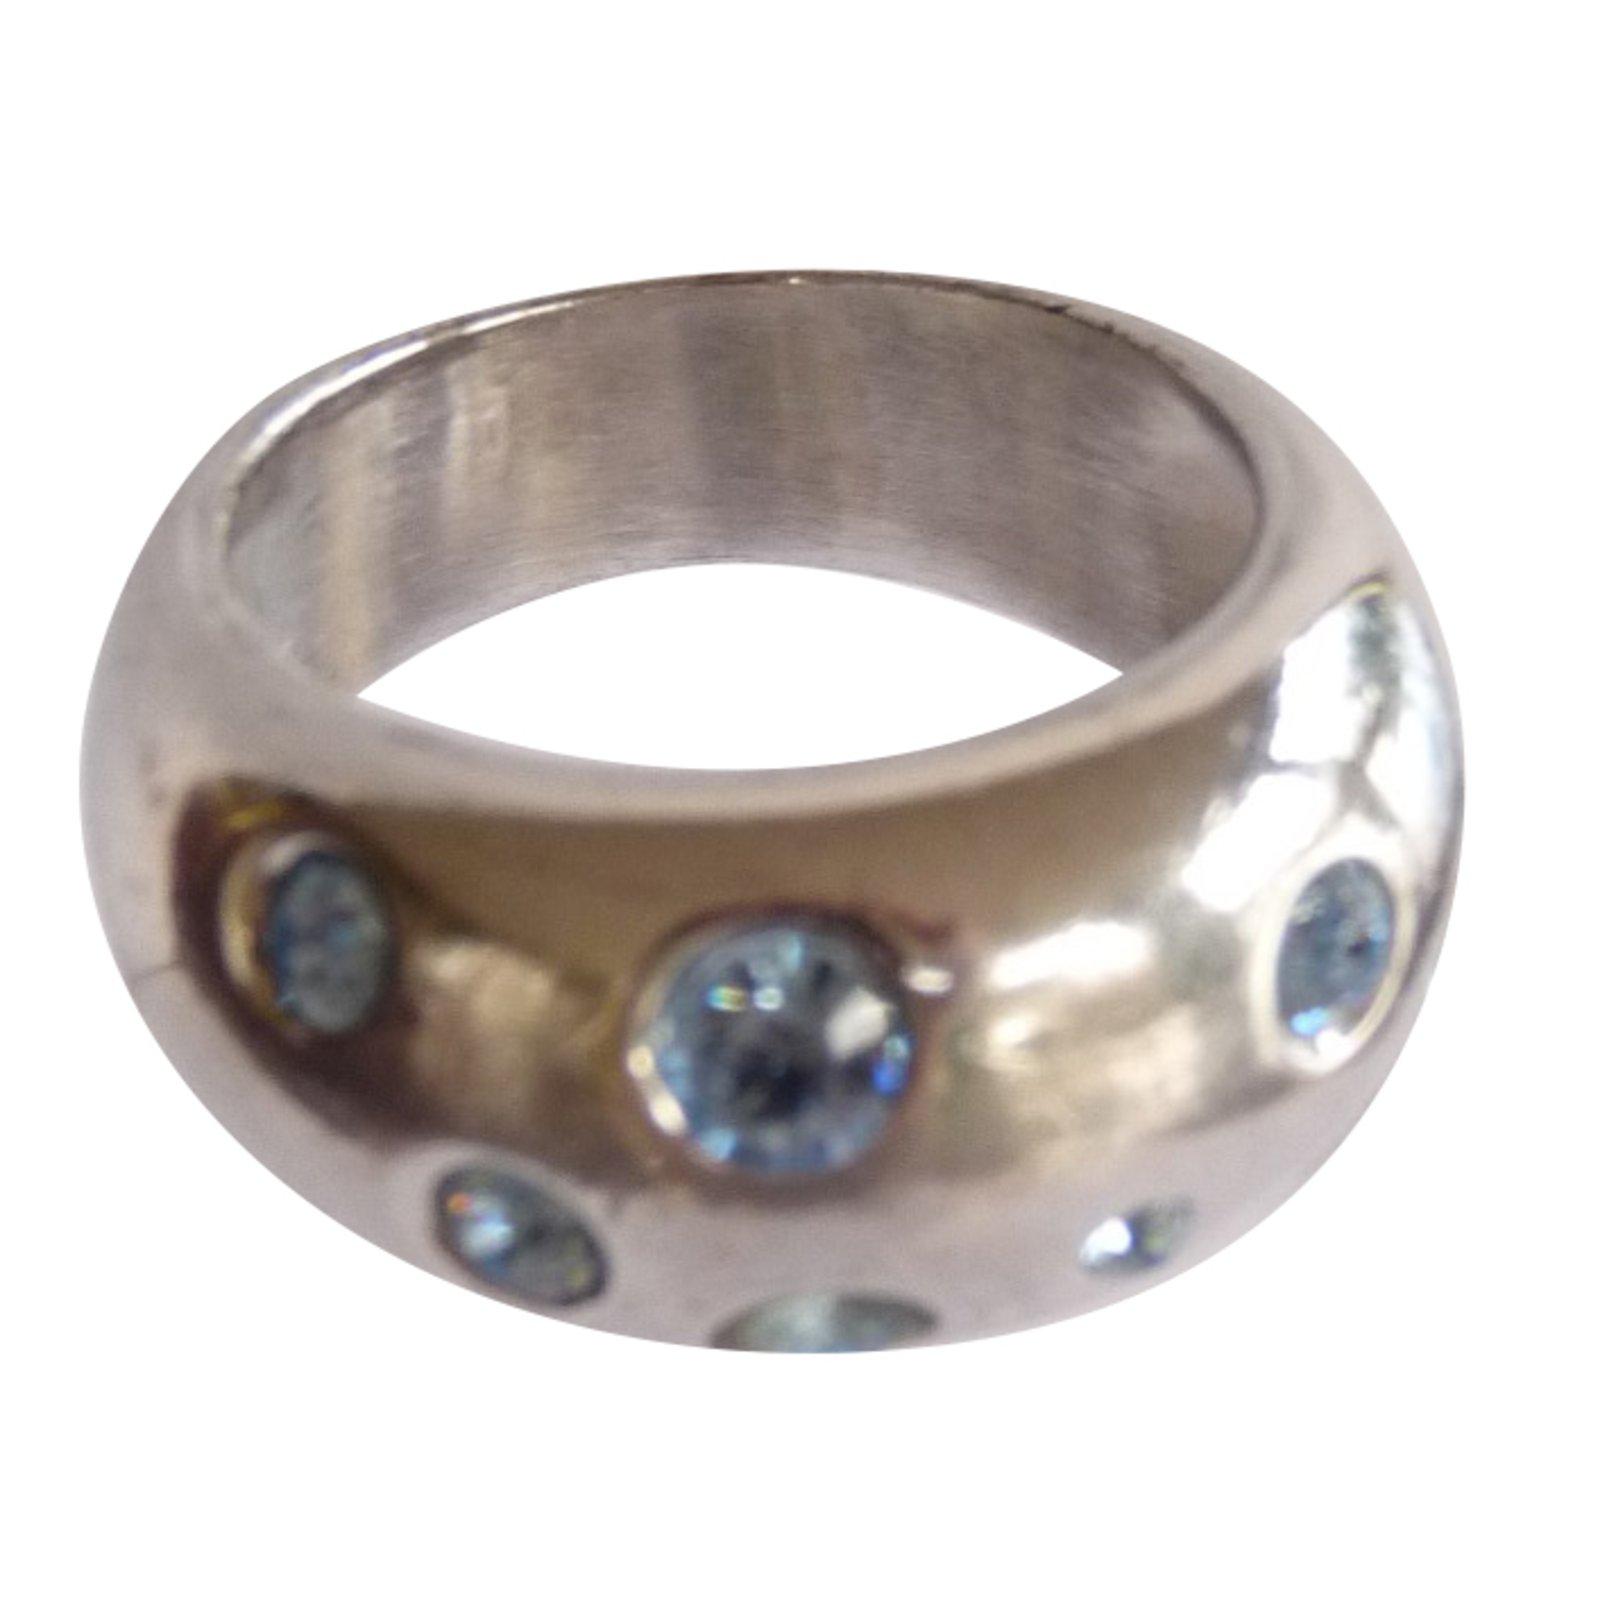 fa33e3a1d267 Yves Saint Laurent rings Rings Silver Silvery ref.87464 - Joli Closet